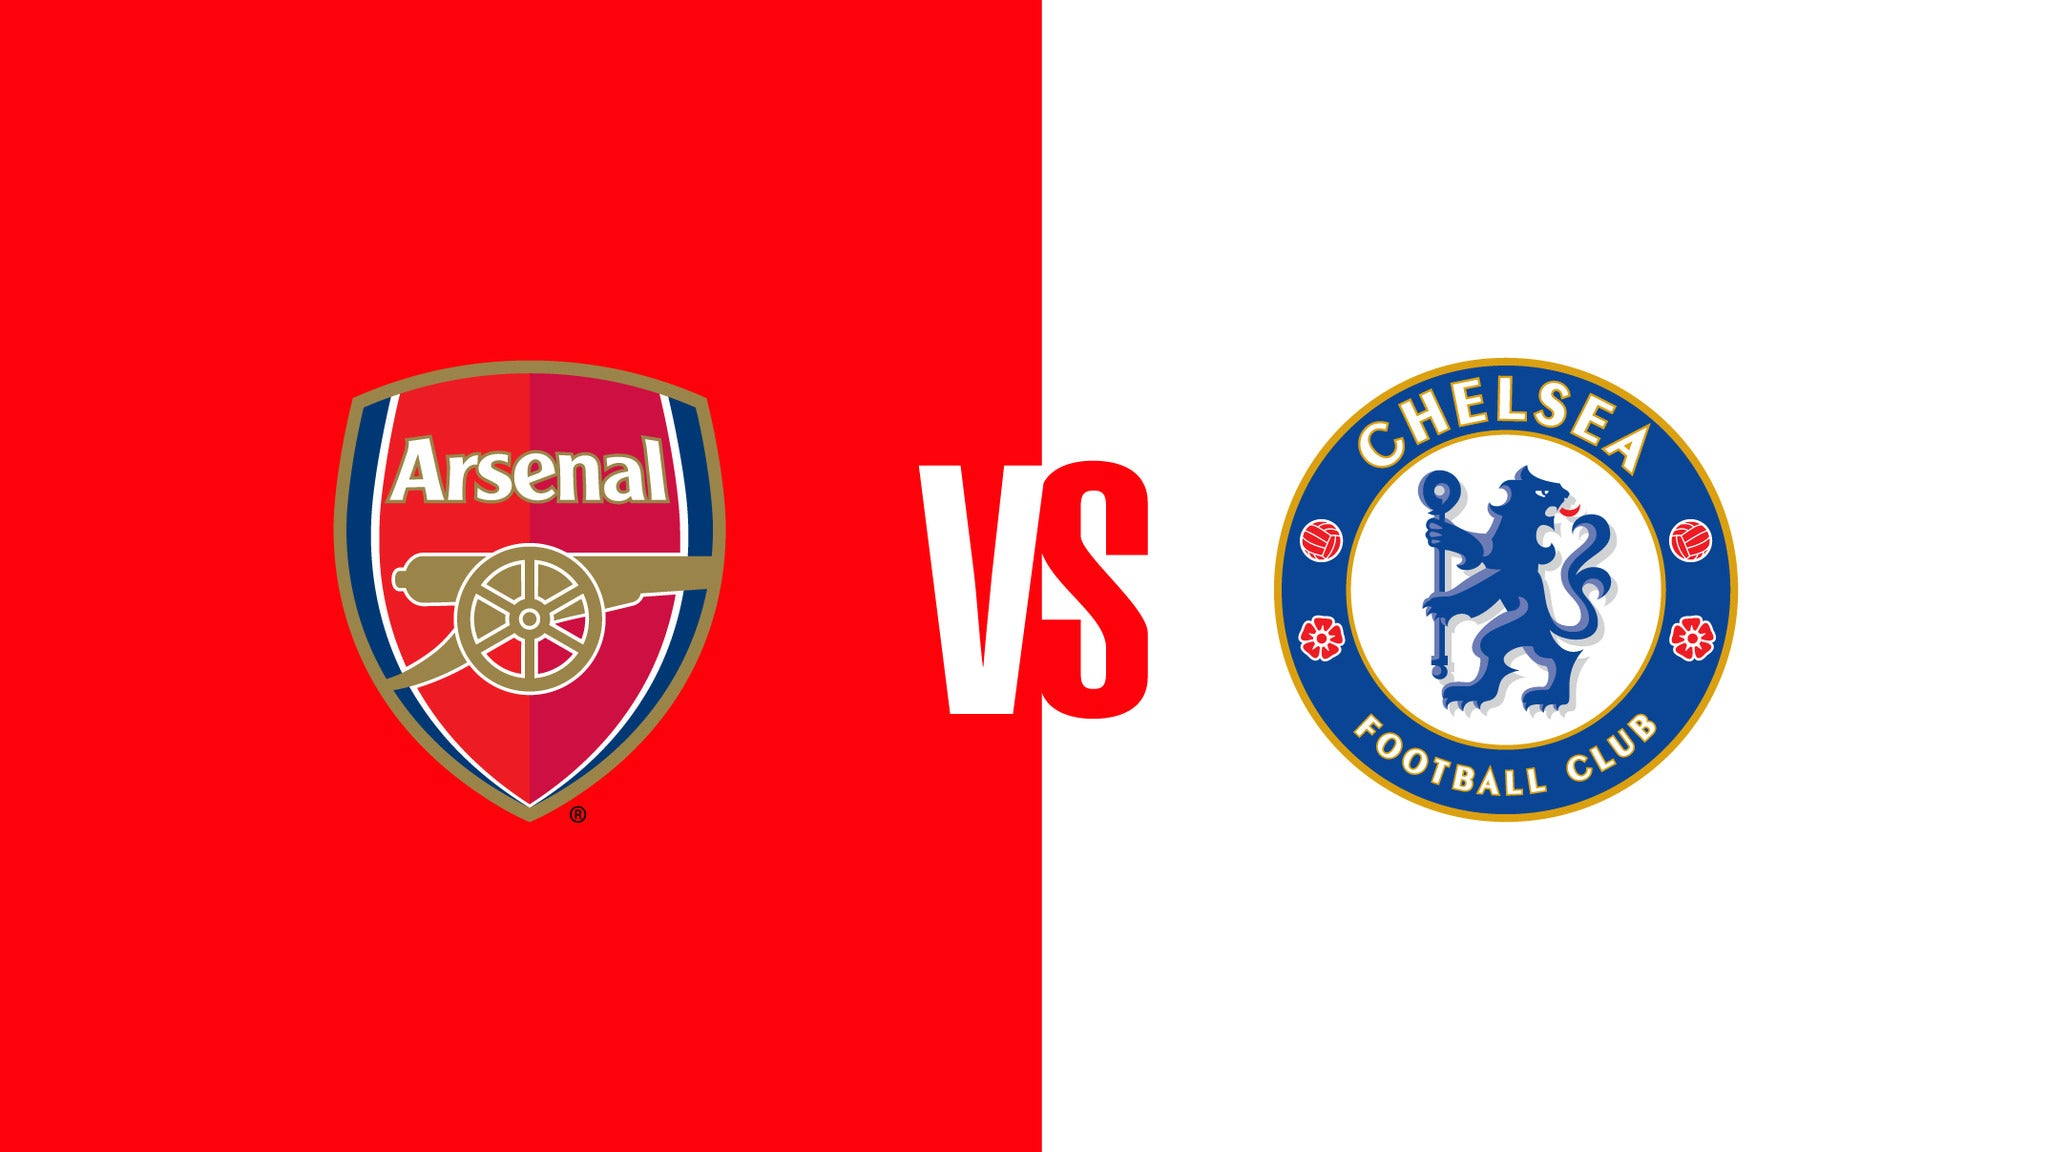 Arsenal FC at International Champions Cup